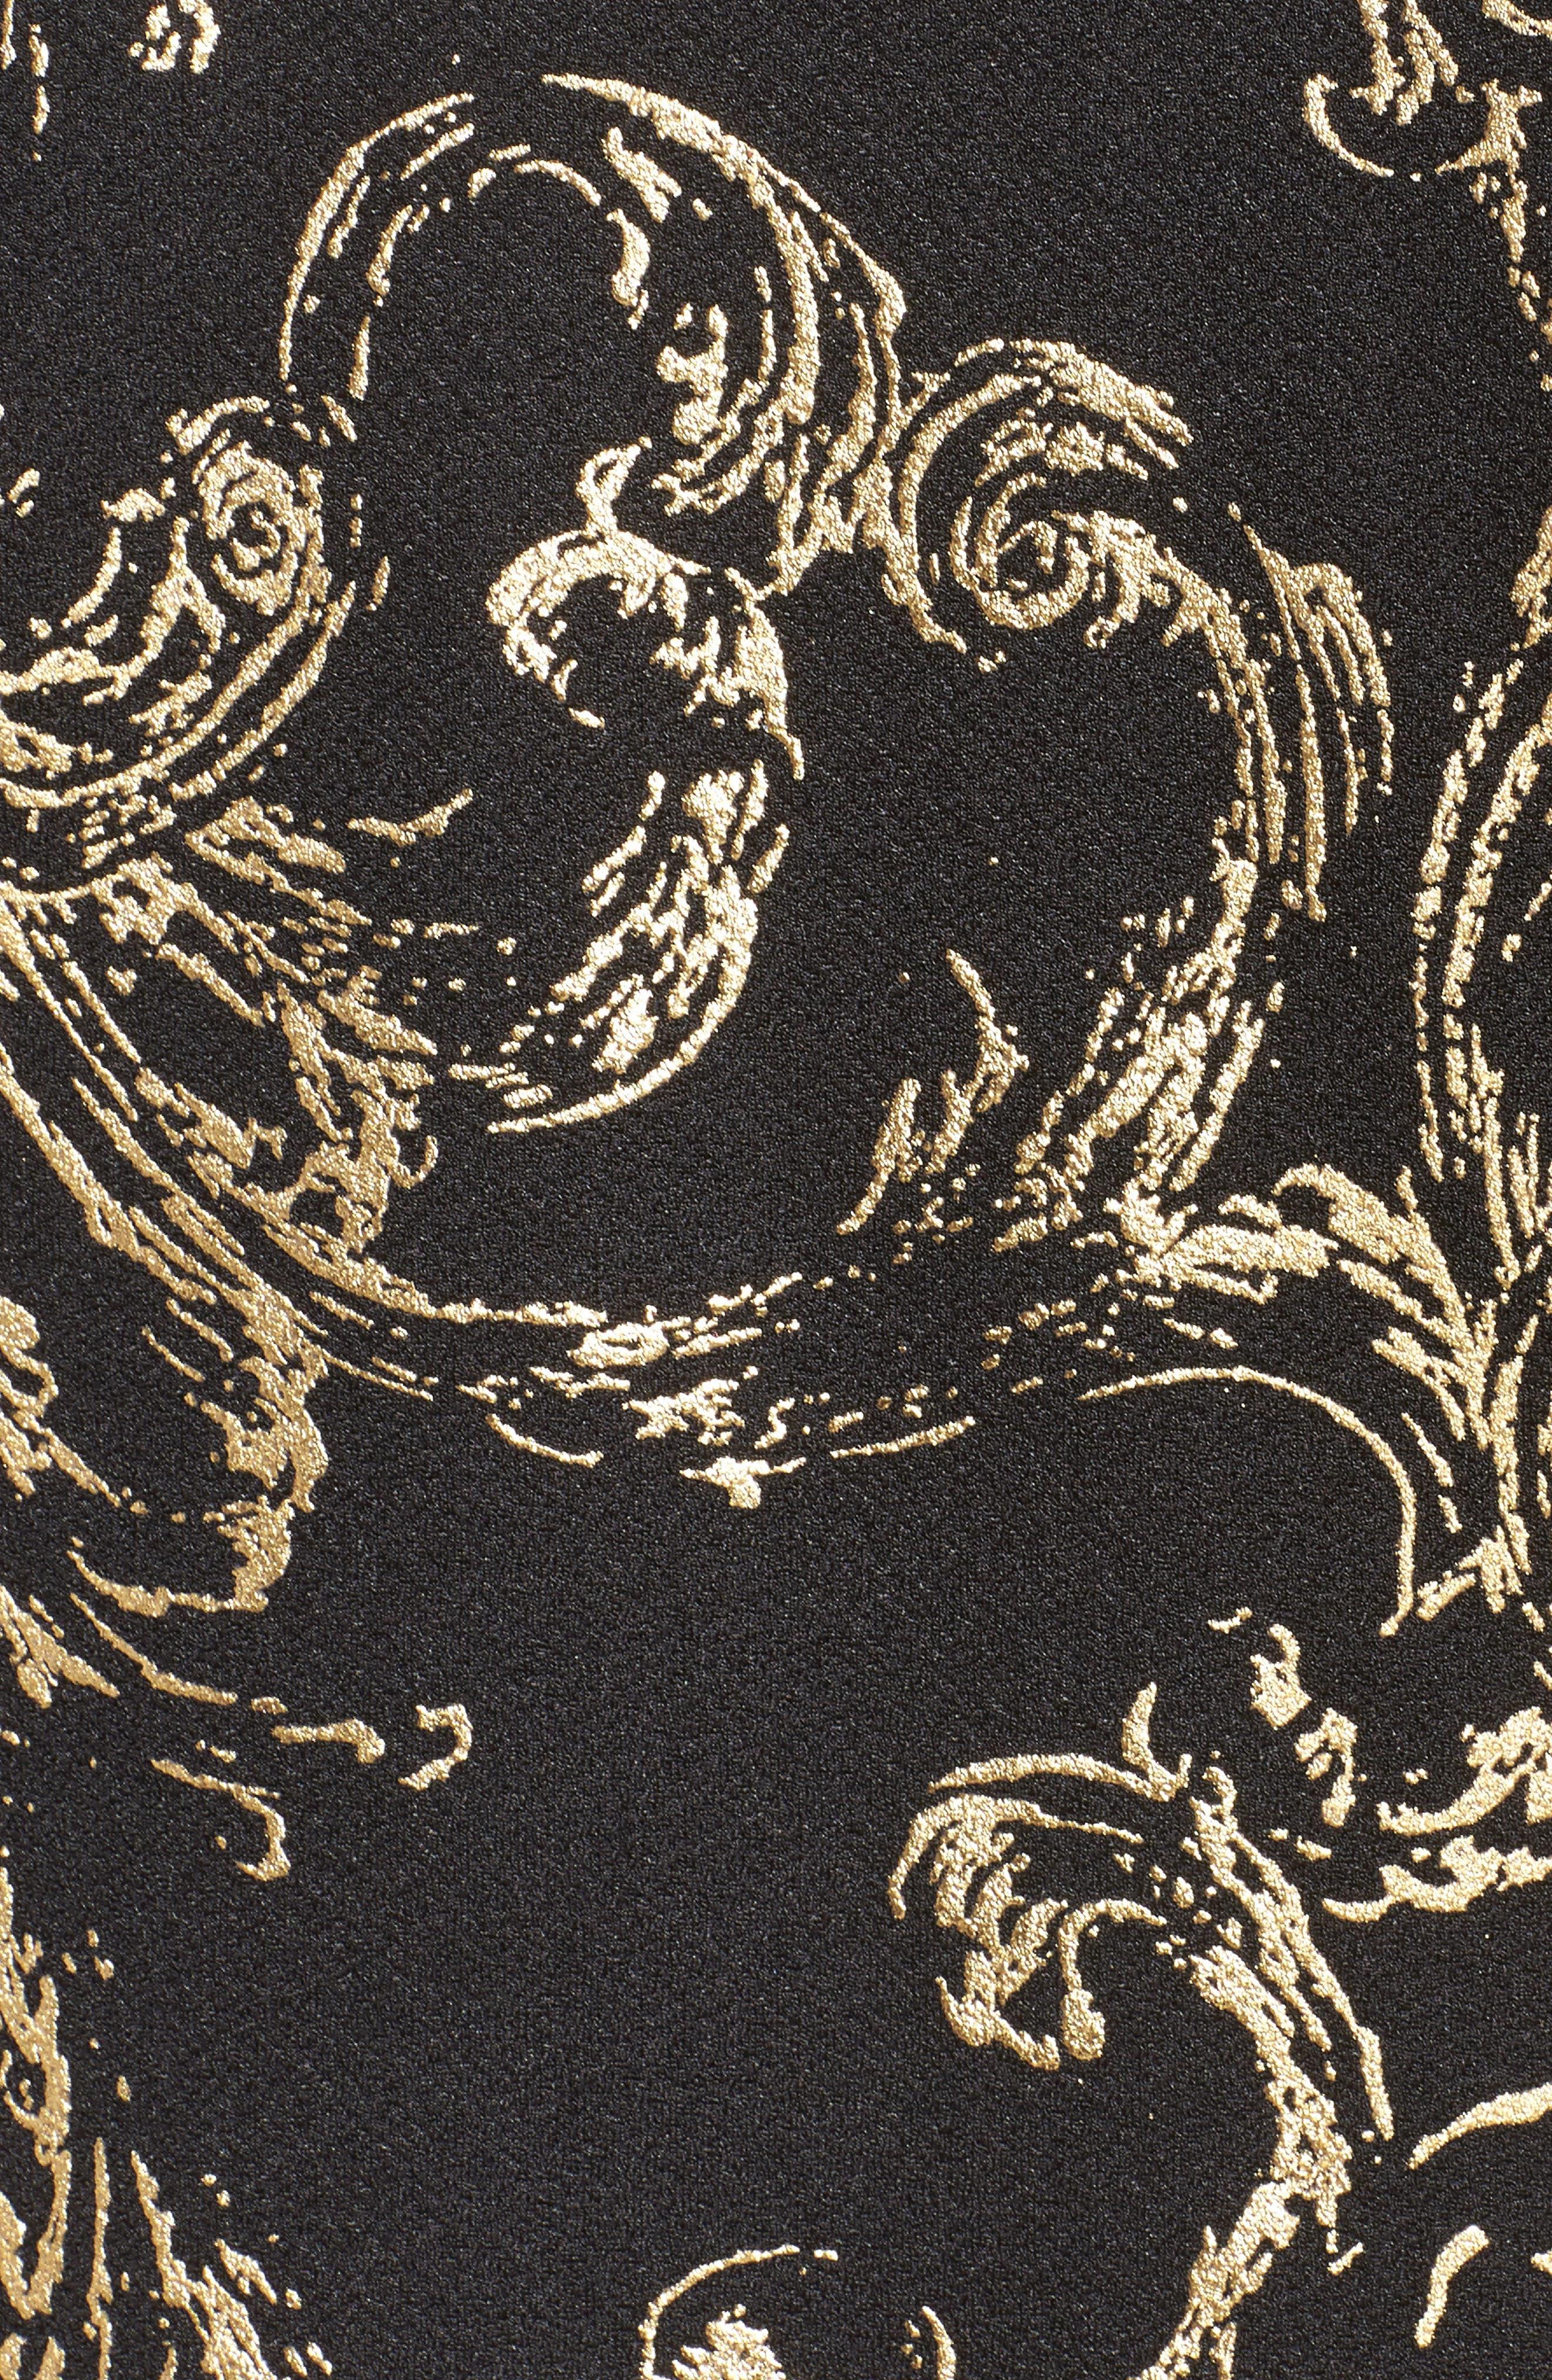 Foiled Print Twinset,                             Alternate thumbnail 5, color,                             Black/ Gold